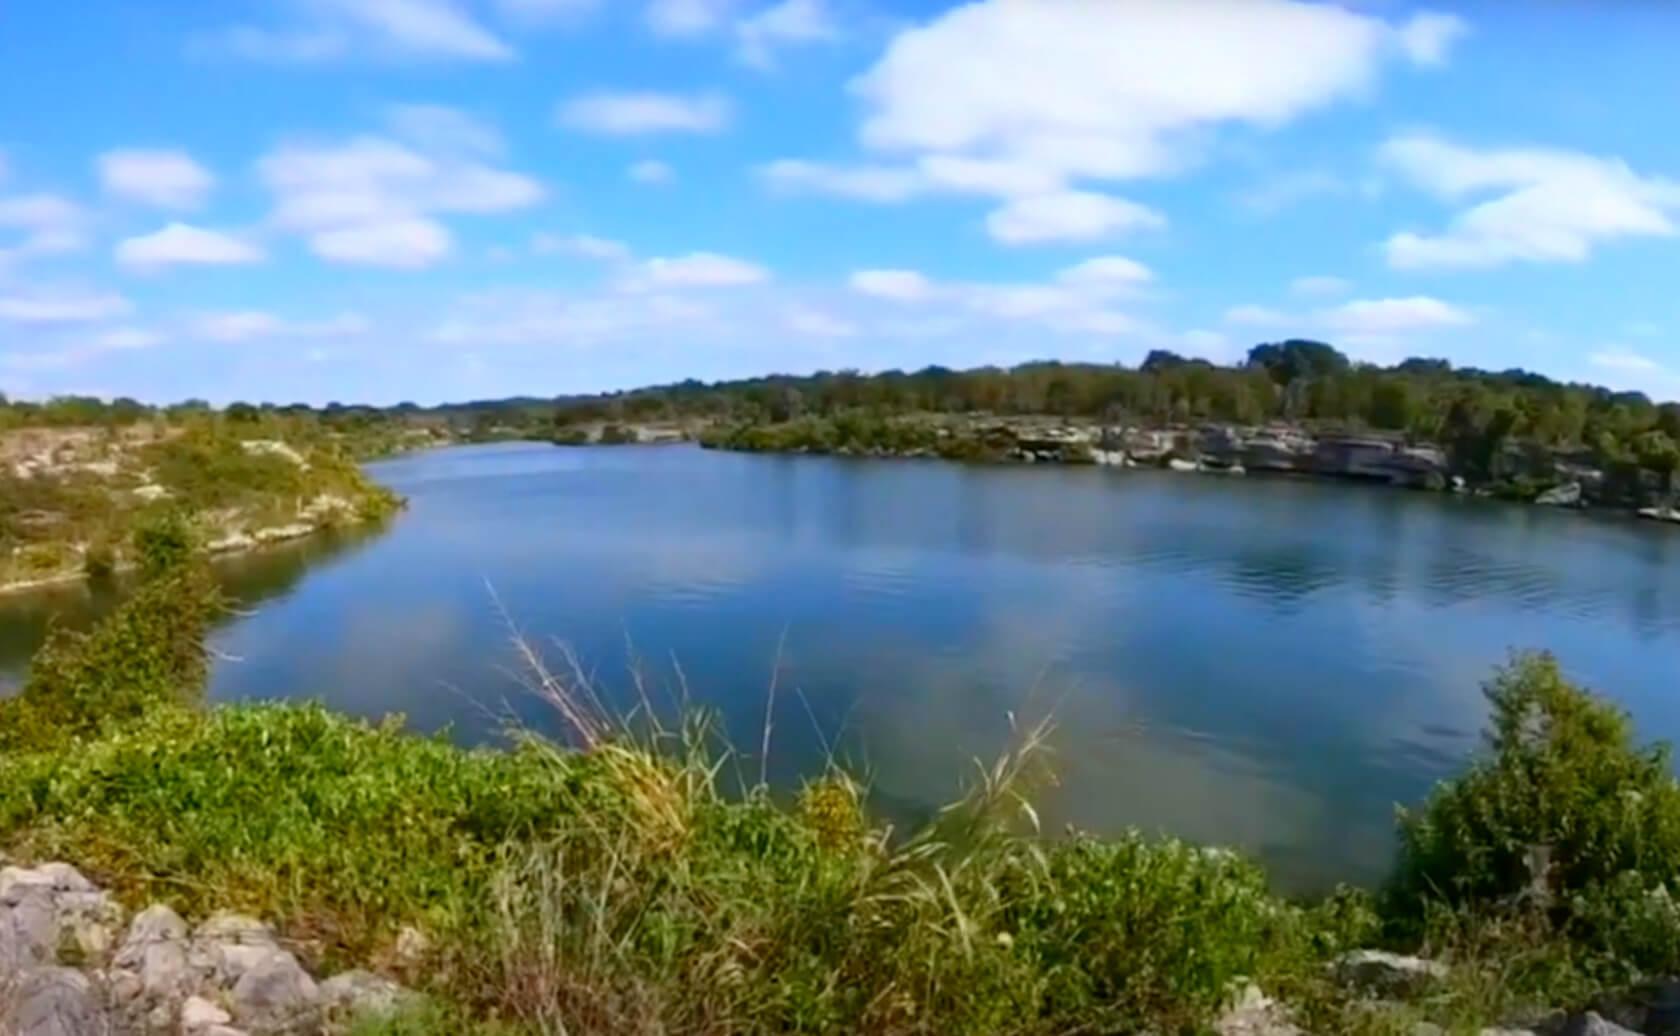 Belton-Lake-Fishing-Guide-Report-Texas-03